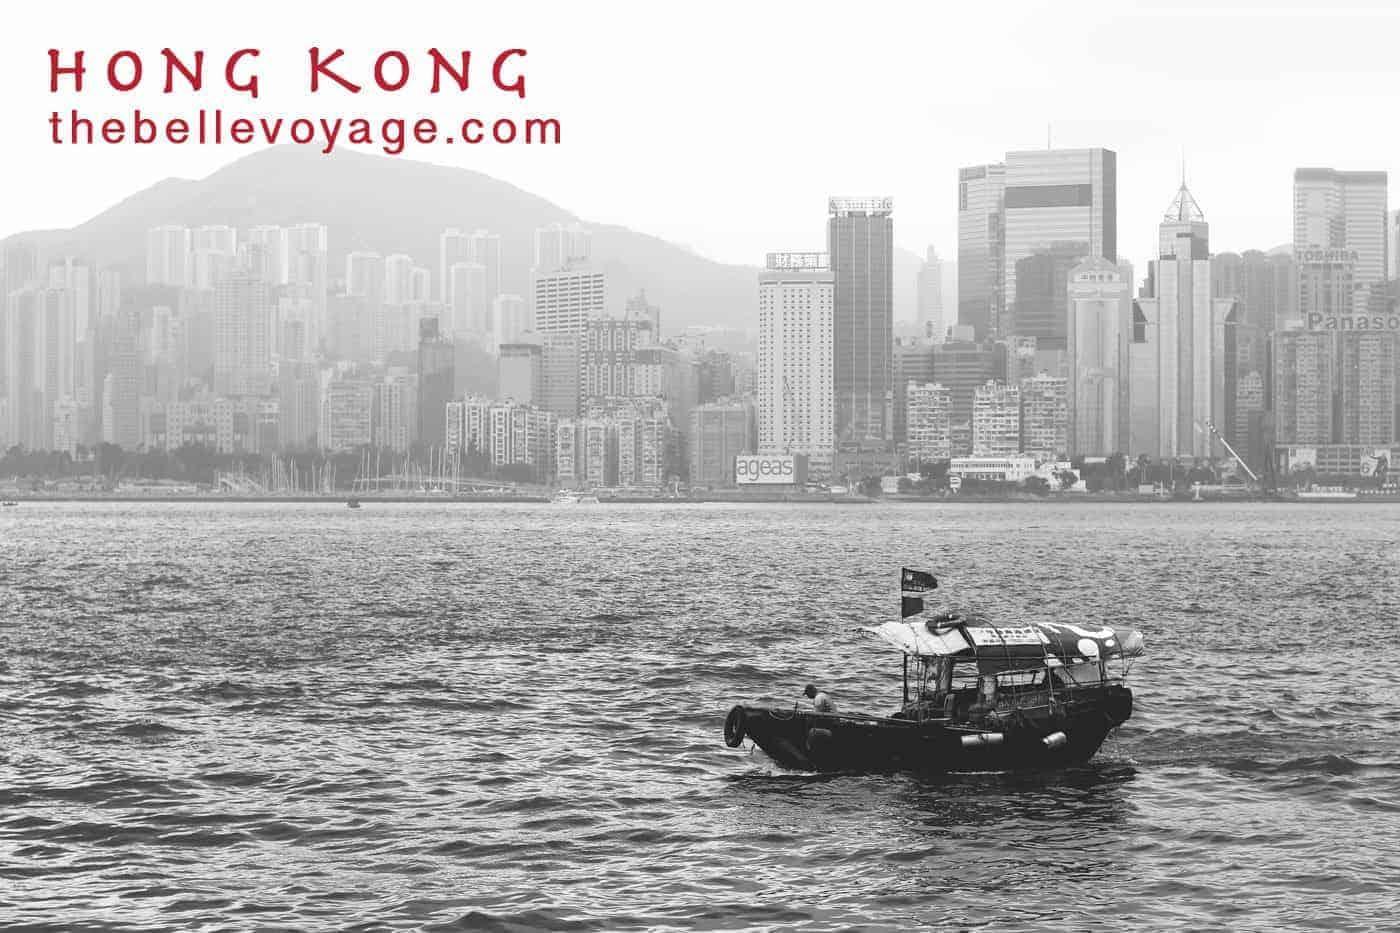 HK Blog Post title